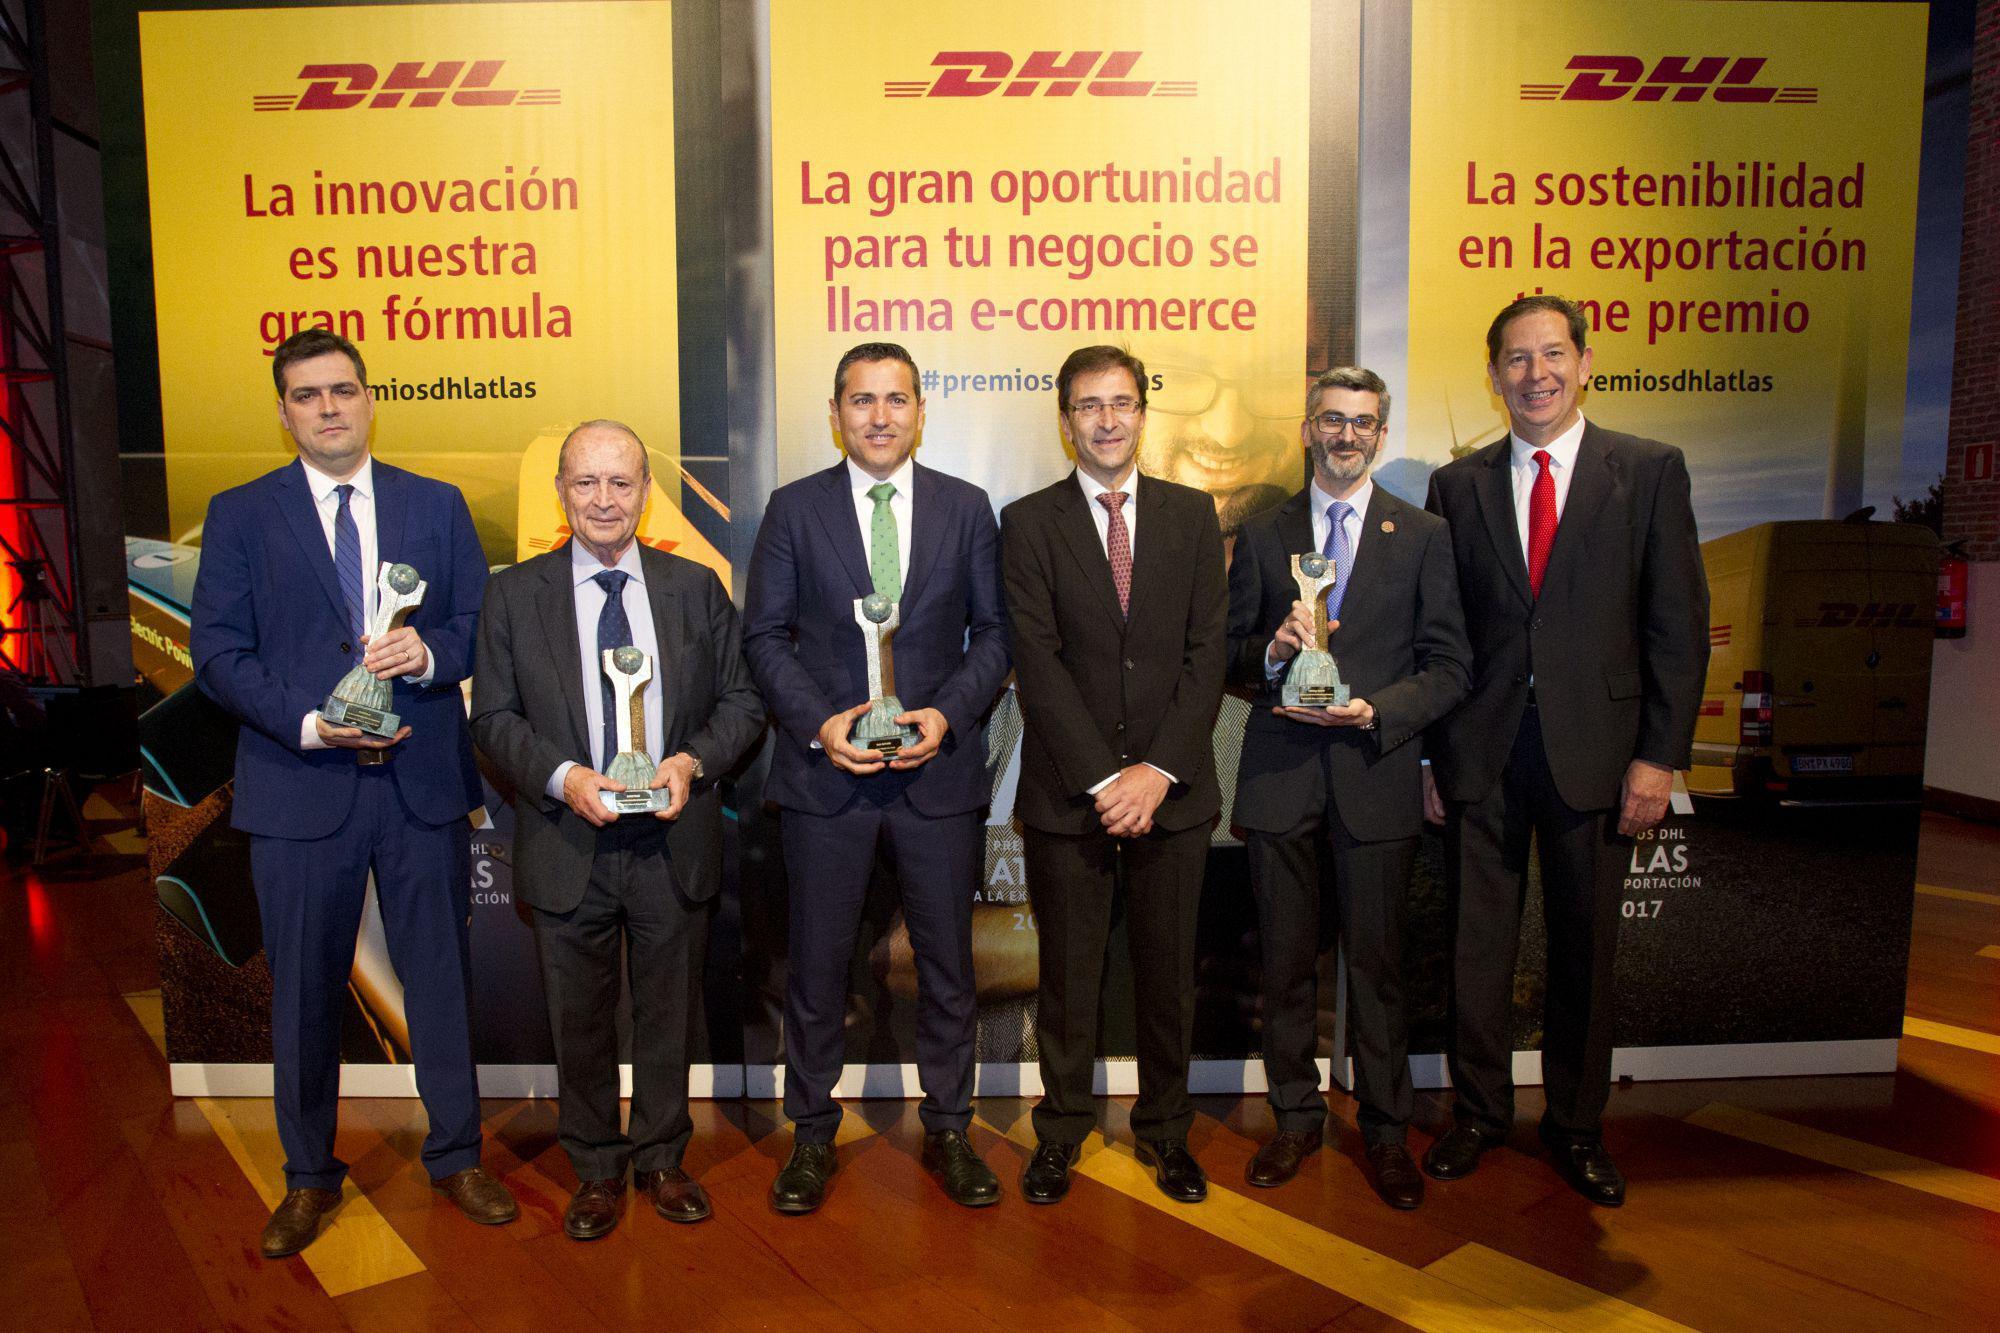 Idai Nature, la empresa ganadora, localiza en América Latina oportunidades muy grandes / Foto: DHL